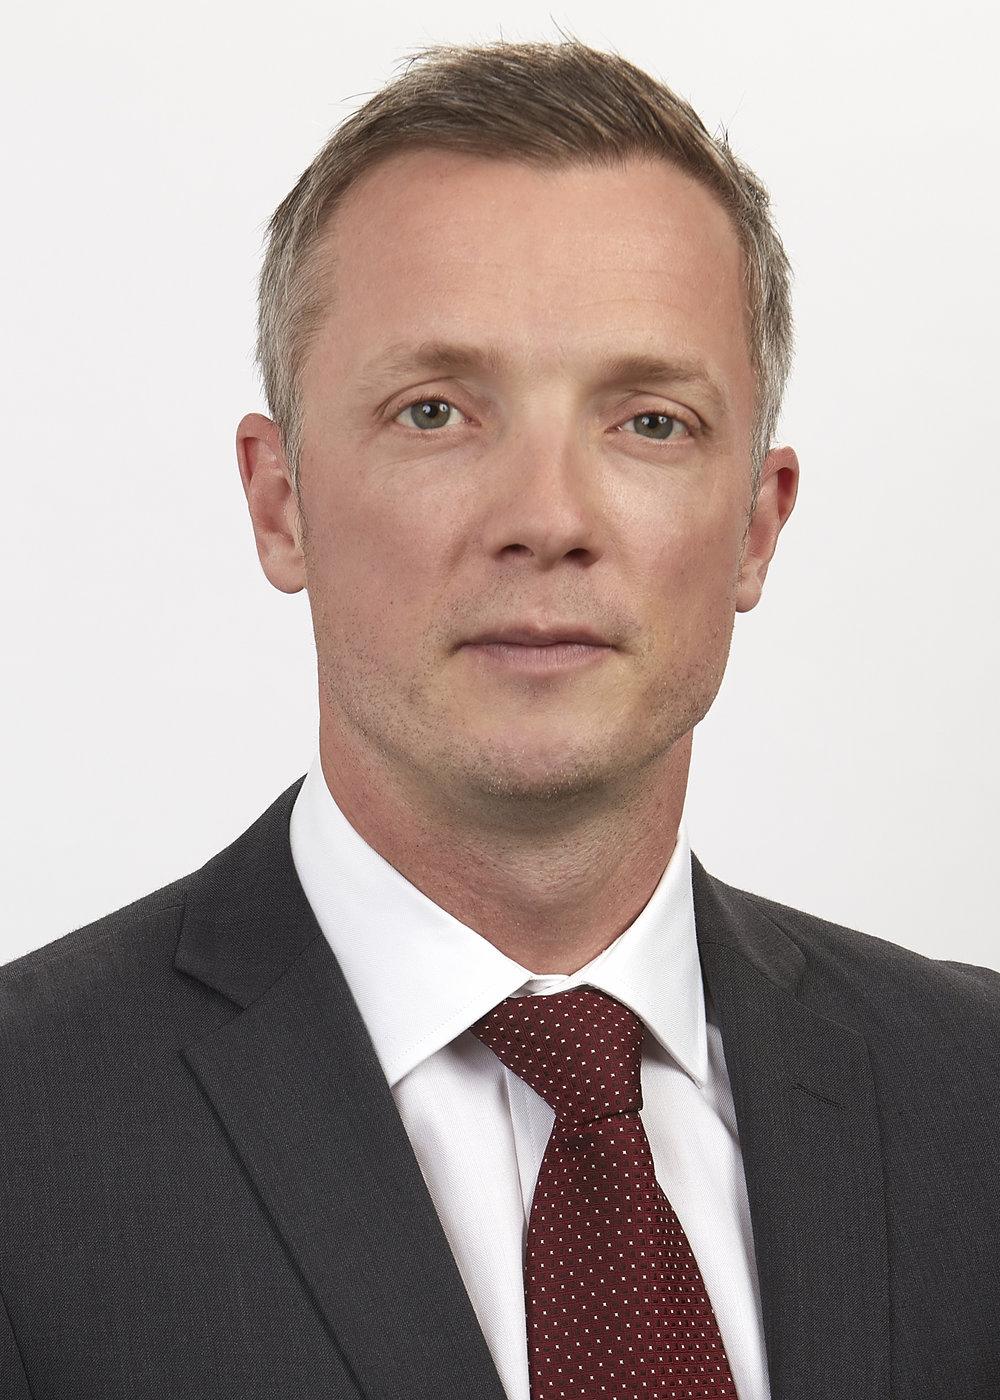 Mans Carlsson-Sweeny - Head of ESG Research, Ausbil